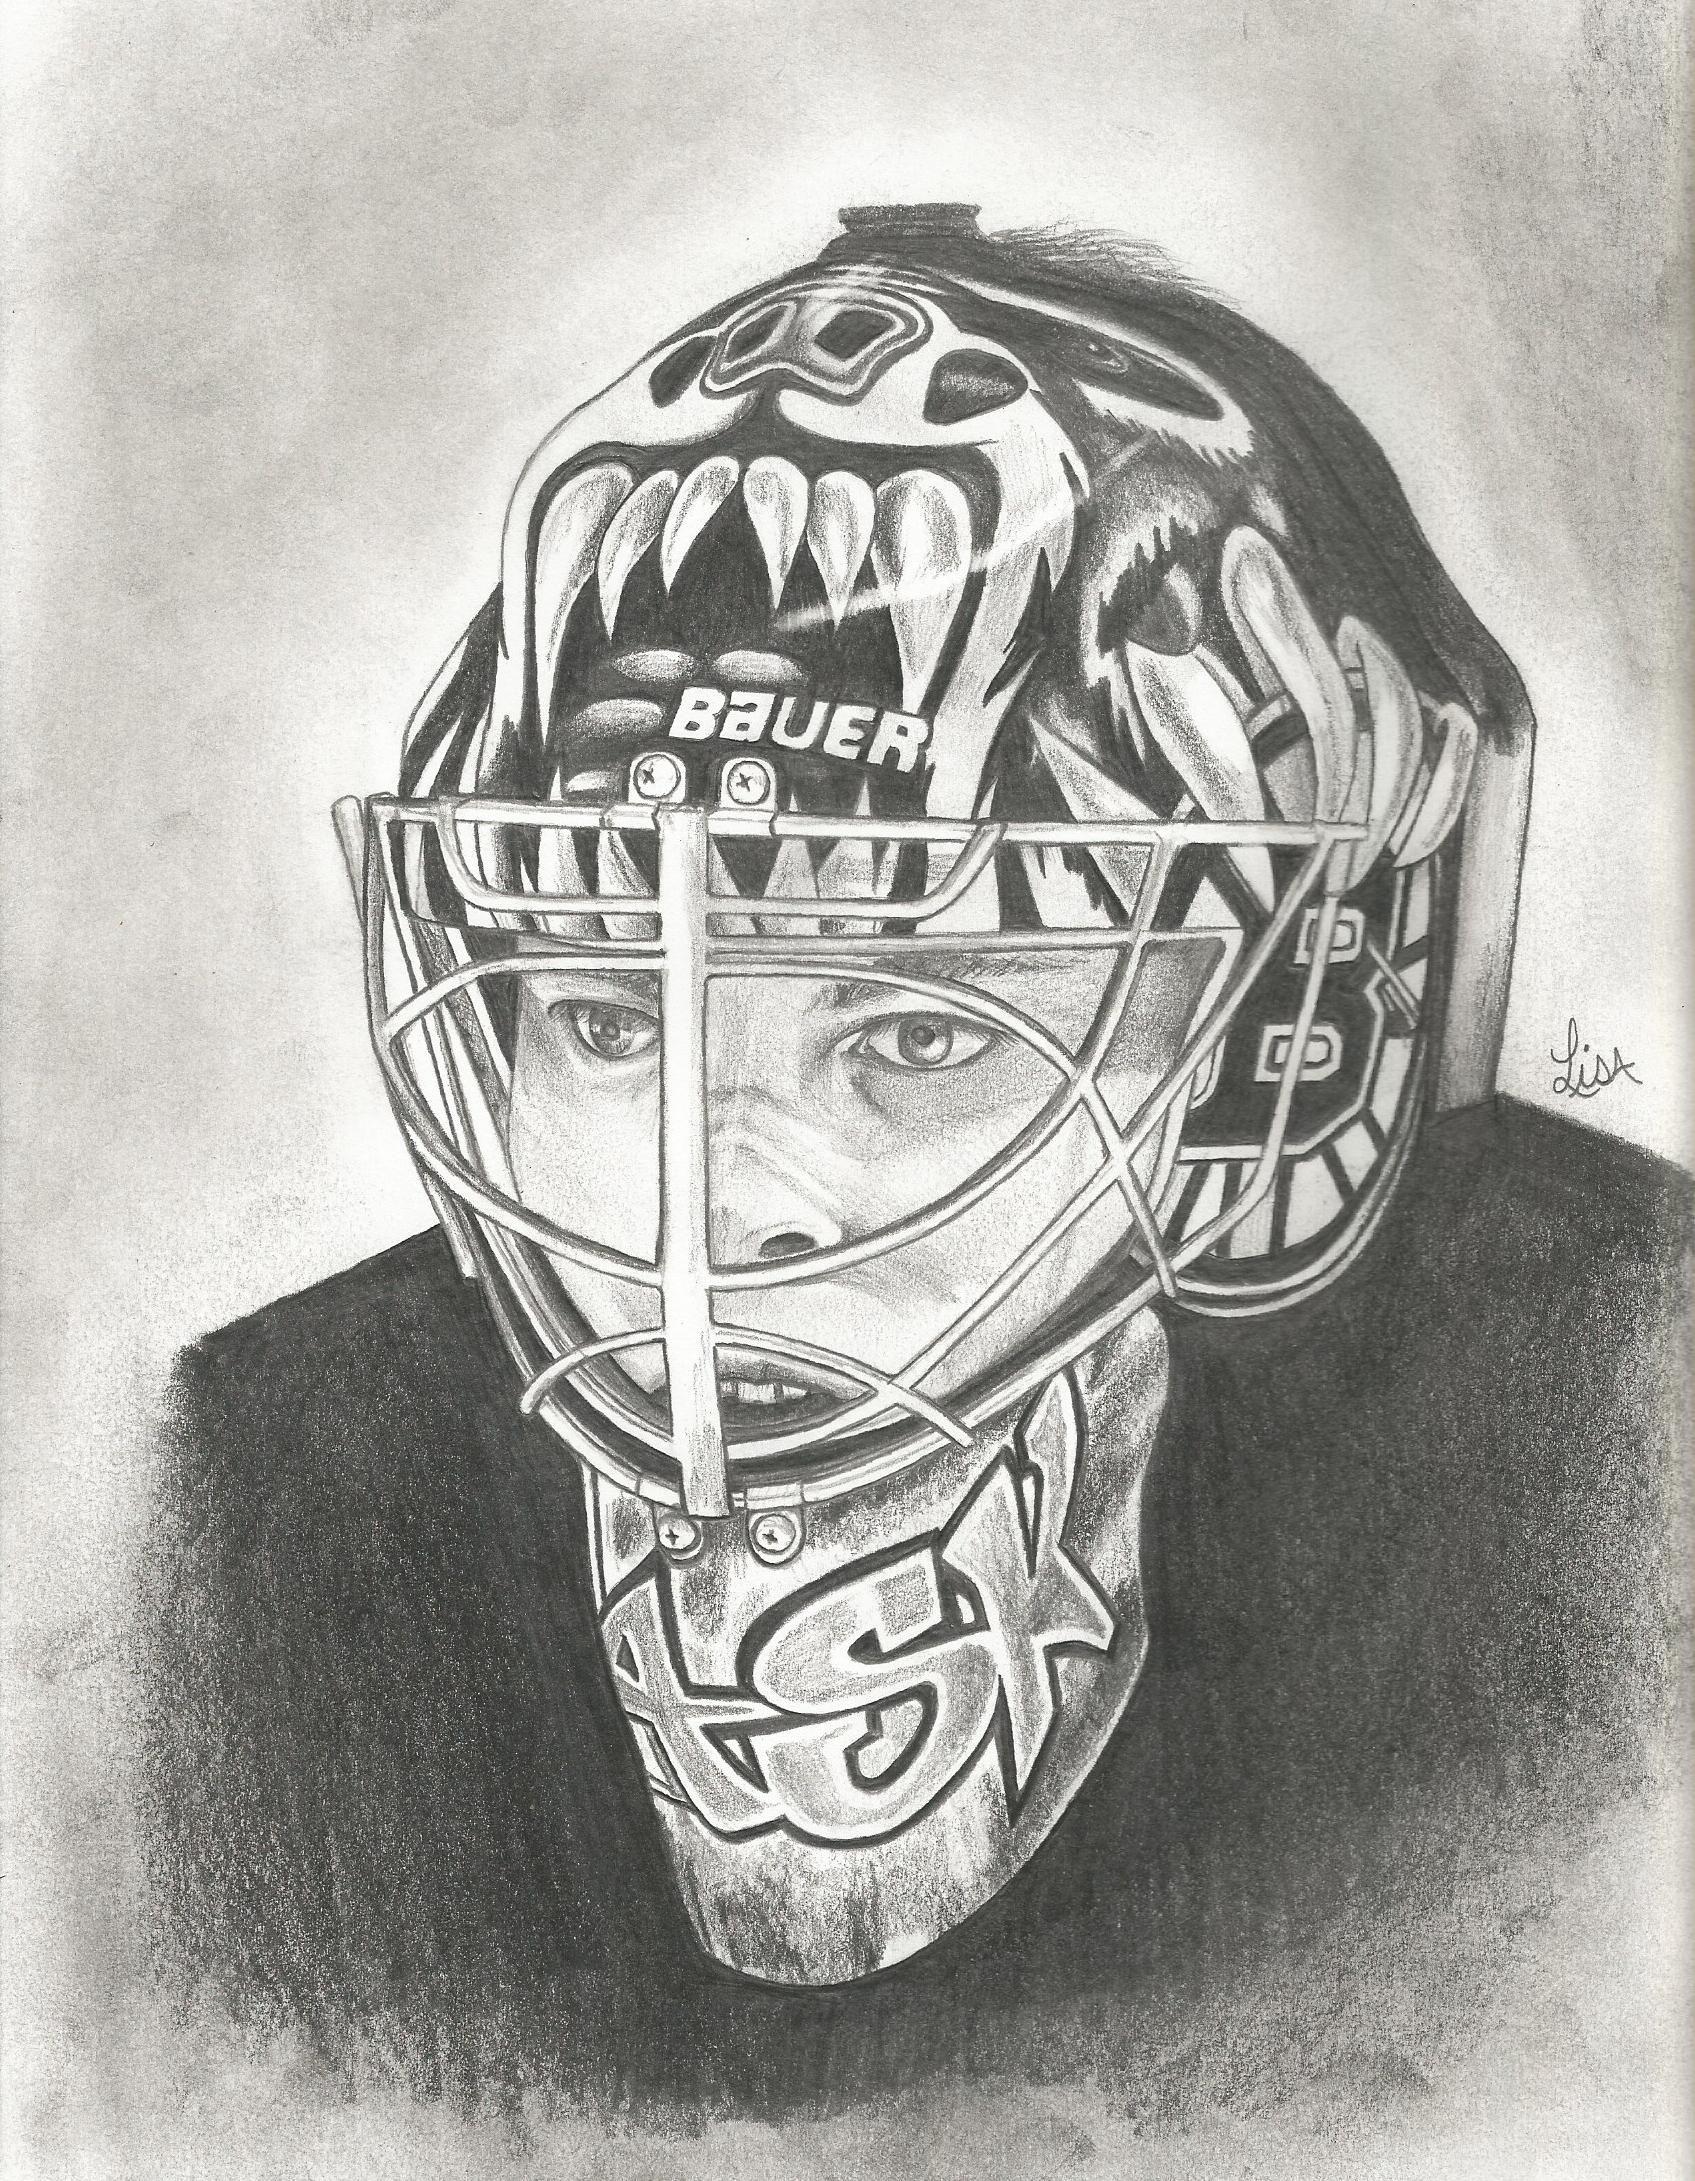 A Pencil Drawing Of Tuukka Rask Goalie For The Boston Bruins By Lisam Drawings Pencil Drawings Art